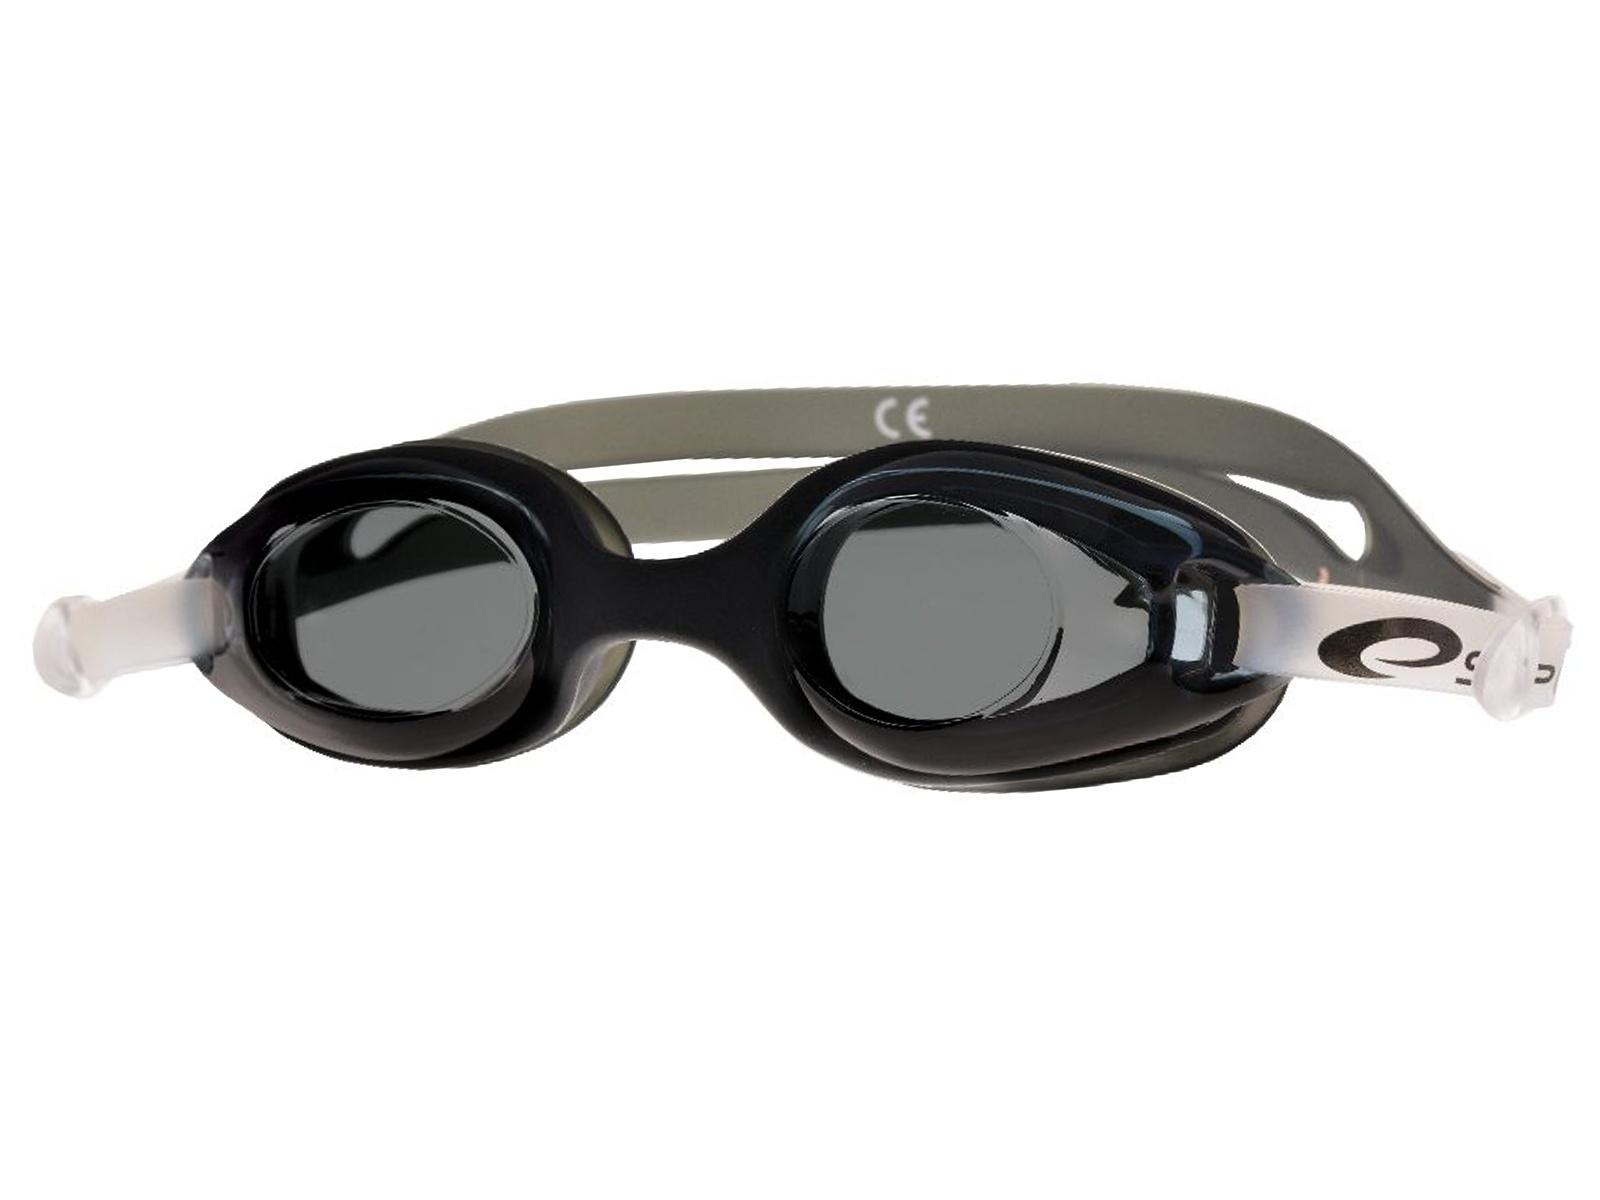 Plavecké brýle SPOKEY Seal - černé